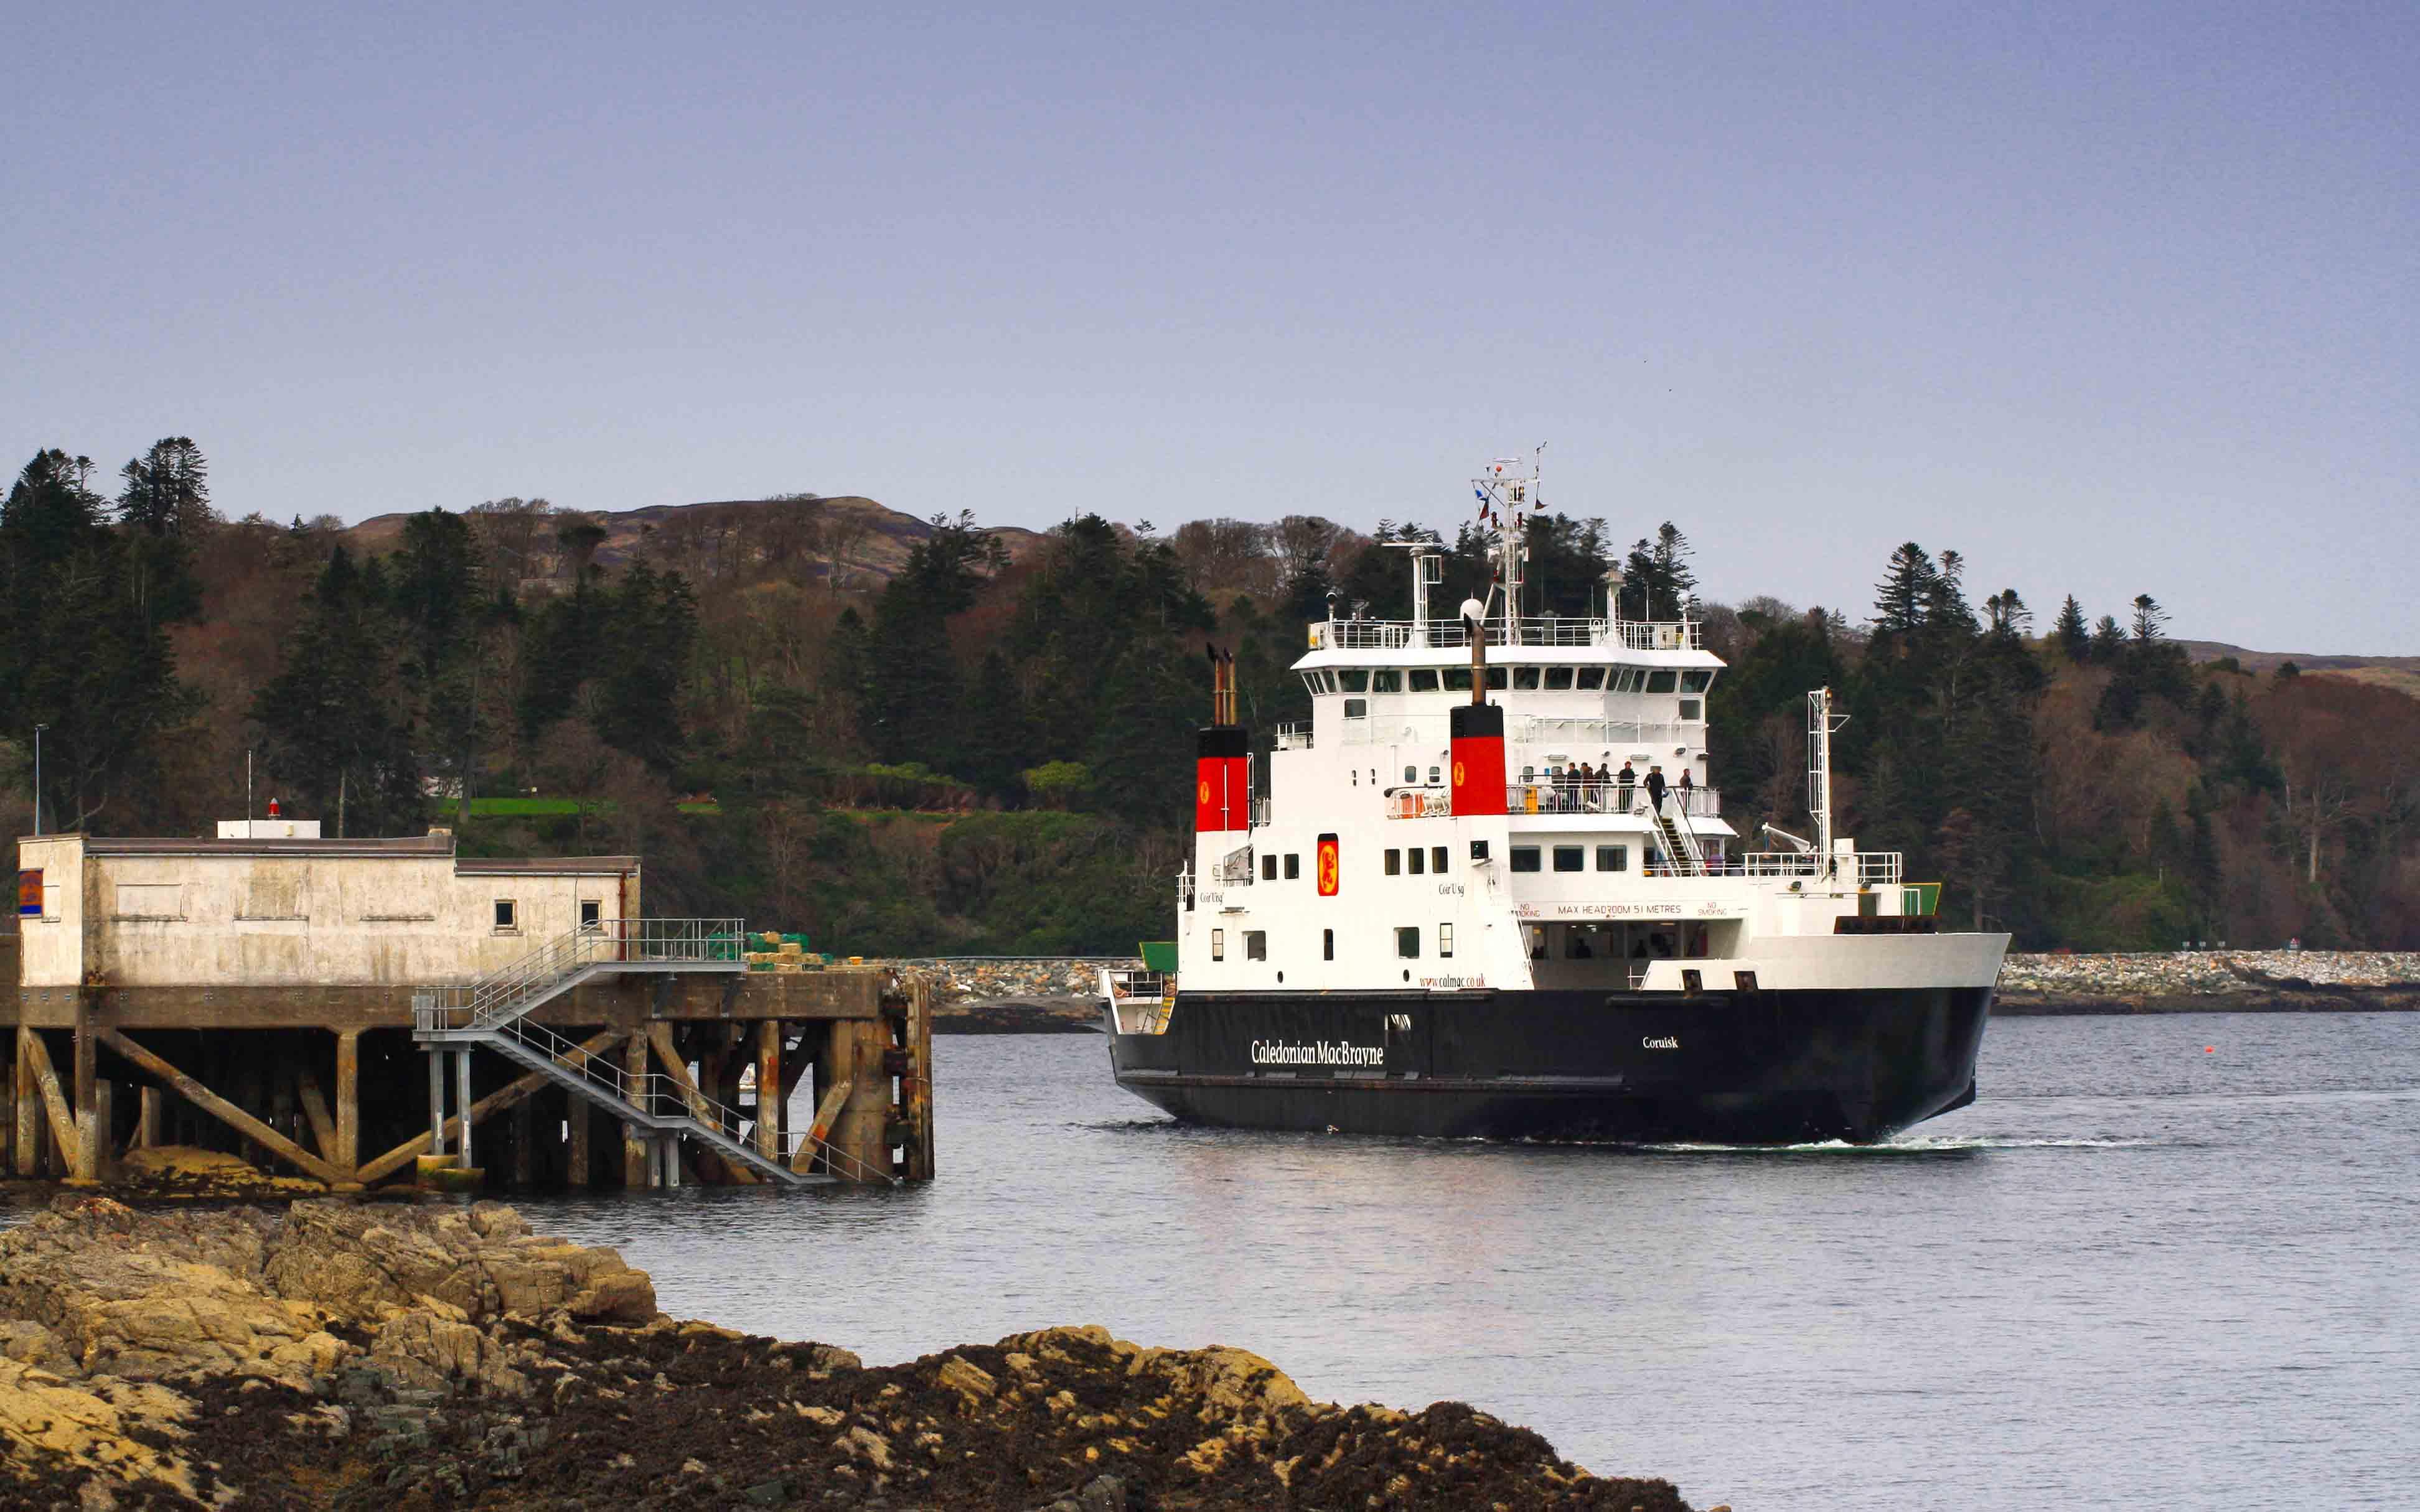 Coruisk arriving at Armadale (Ships of CalMac)